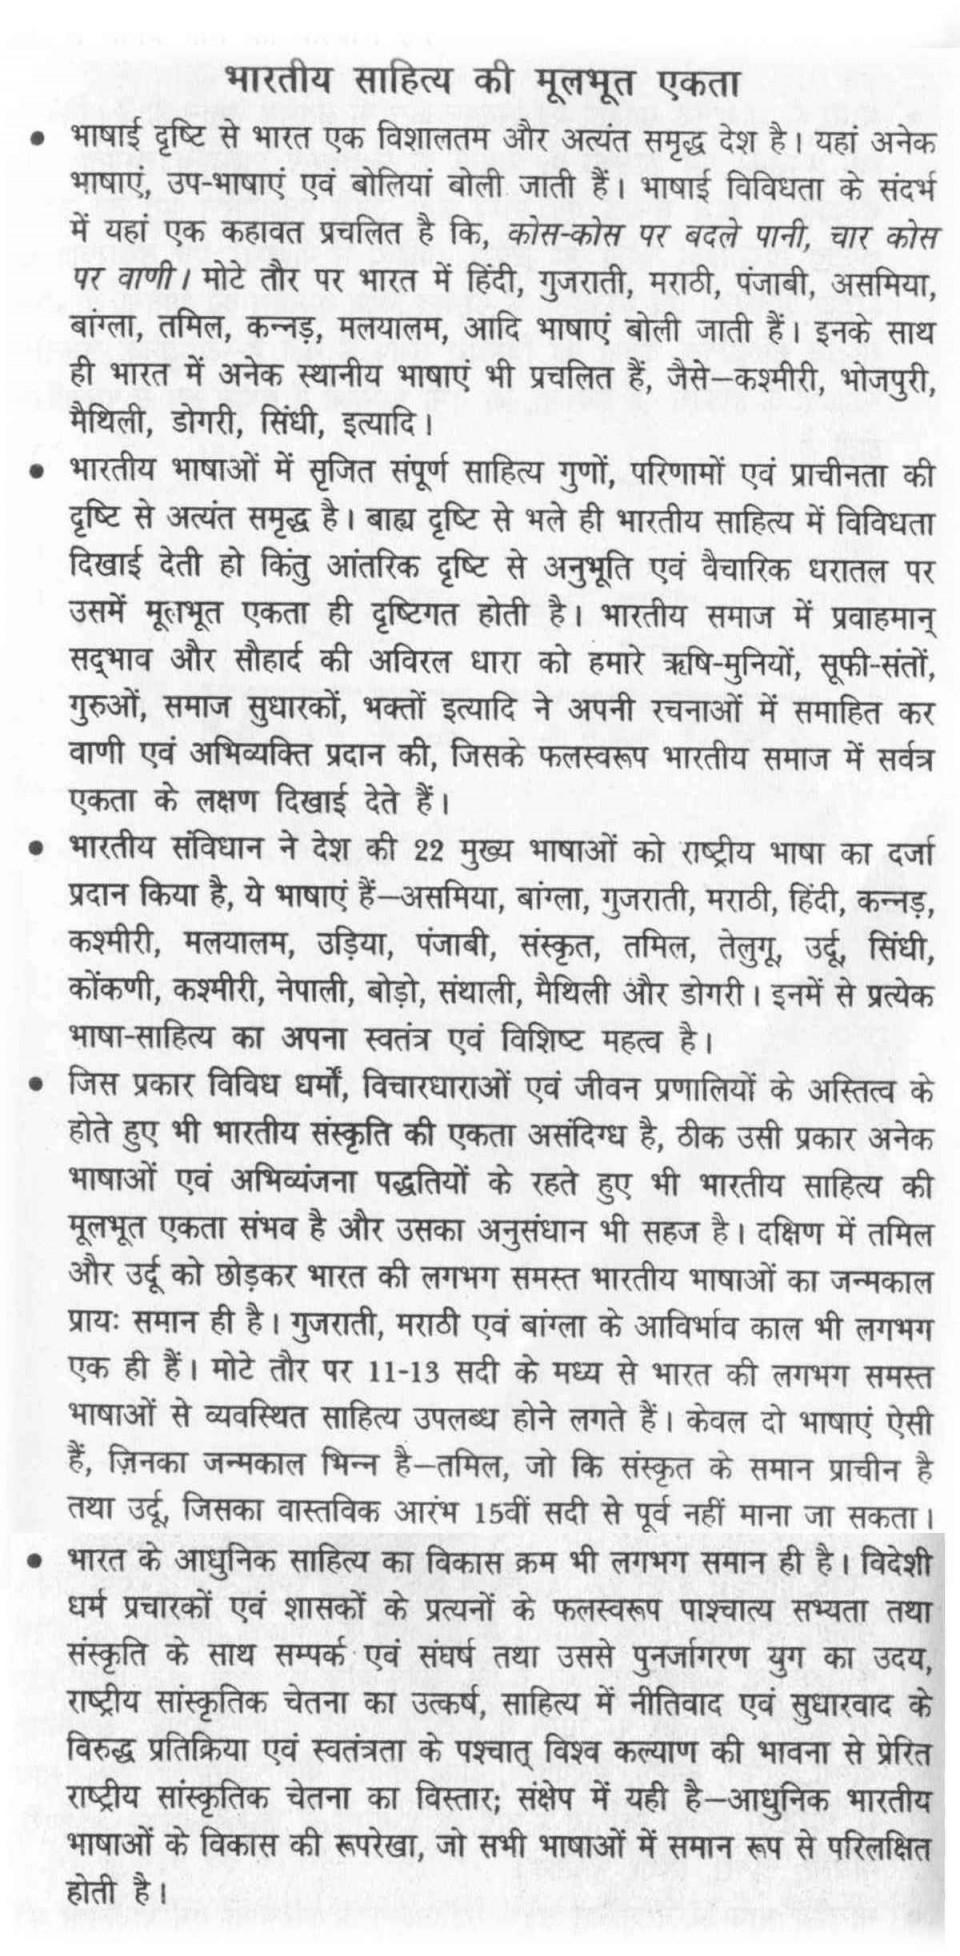 004 Greed Essay Example 11 Thumb2 Awful Greedy Dog In Hindi Topics Is A Curse 960